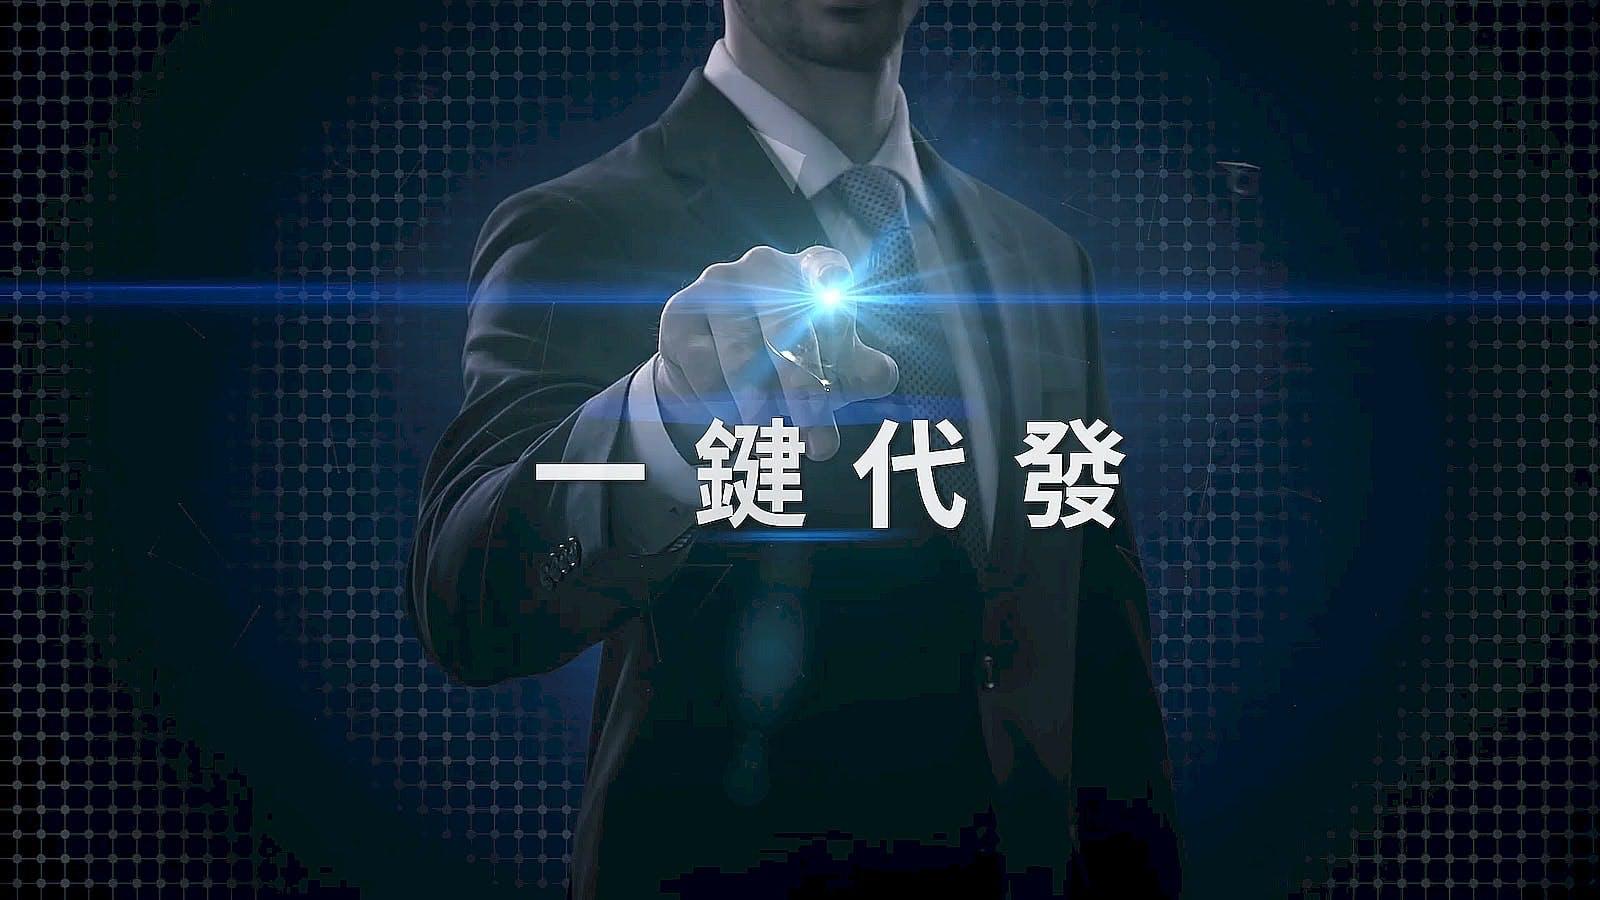 TCI 大江生醫 一鍵代發服務 幫客戶省時省力 賣向世界